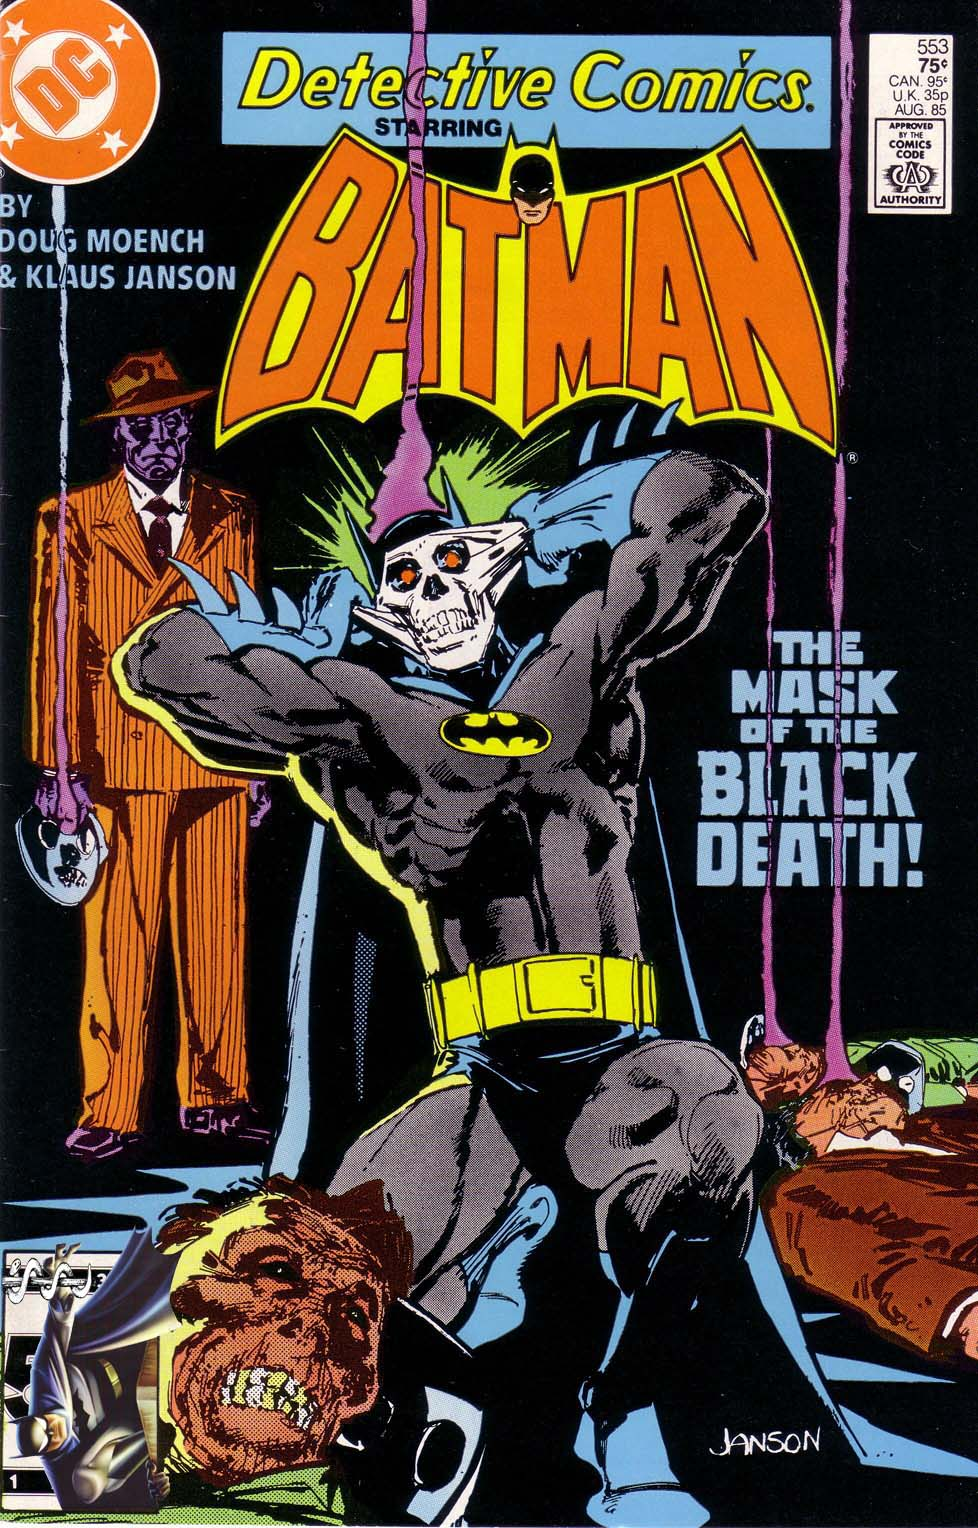 Detective Comics (1937) 553 Page 1